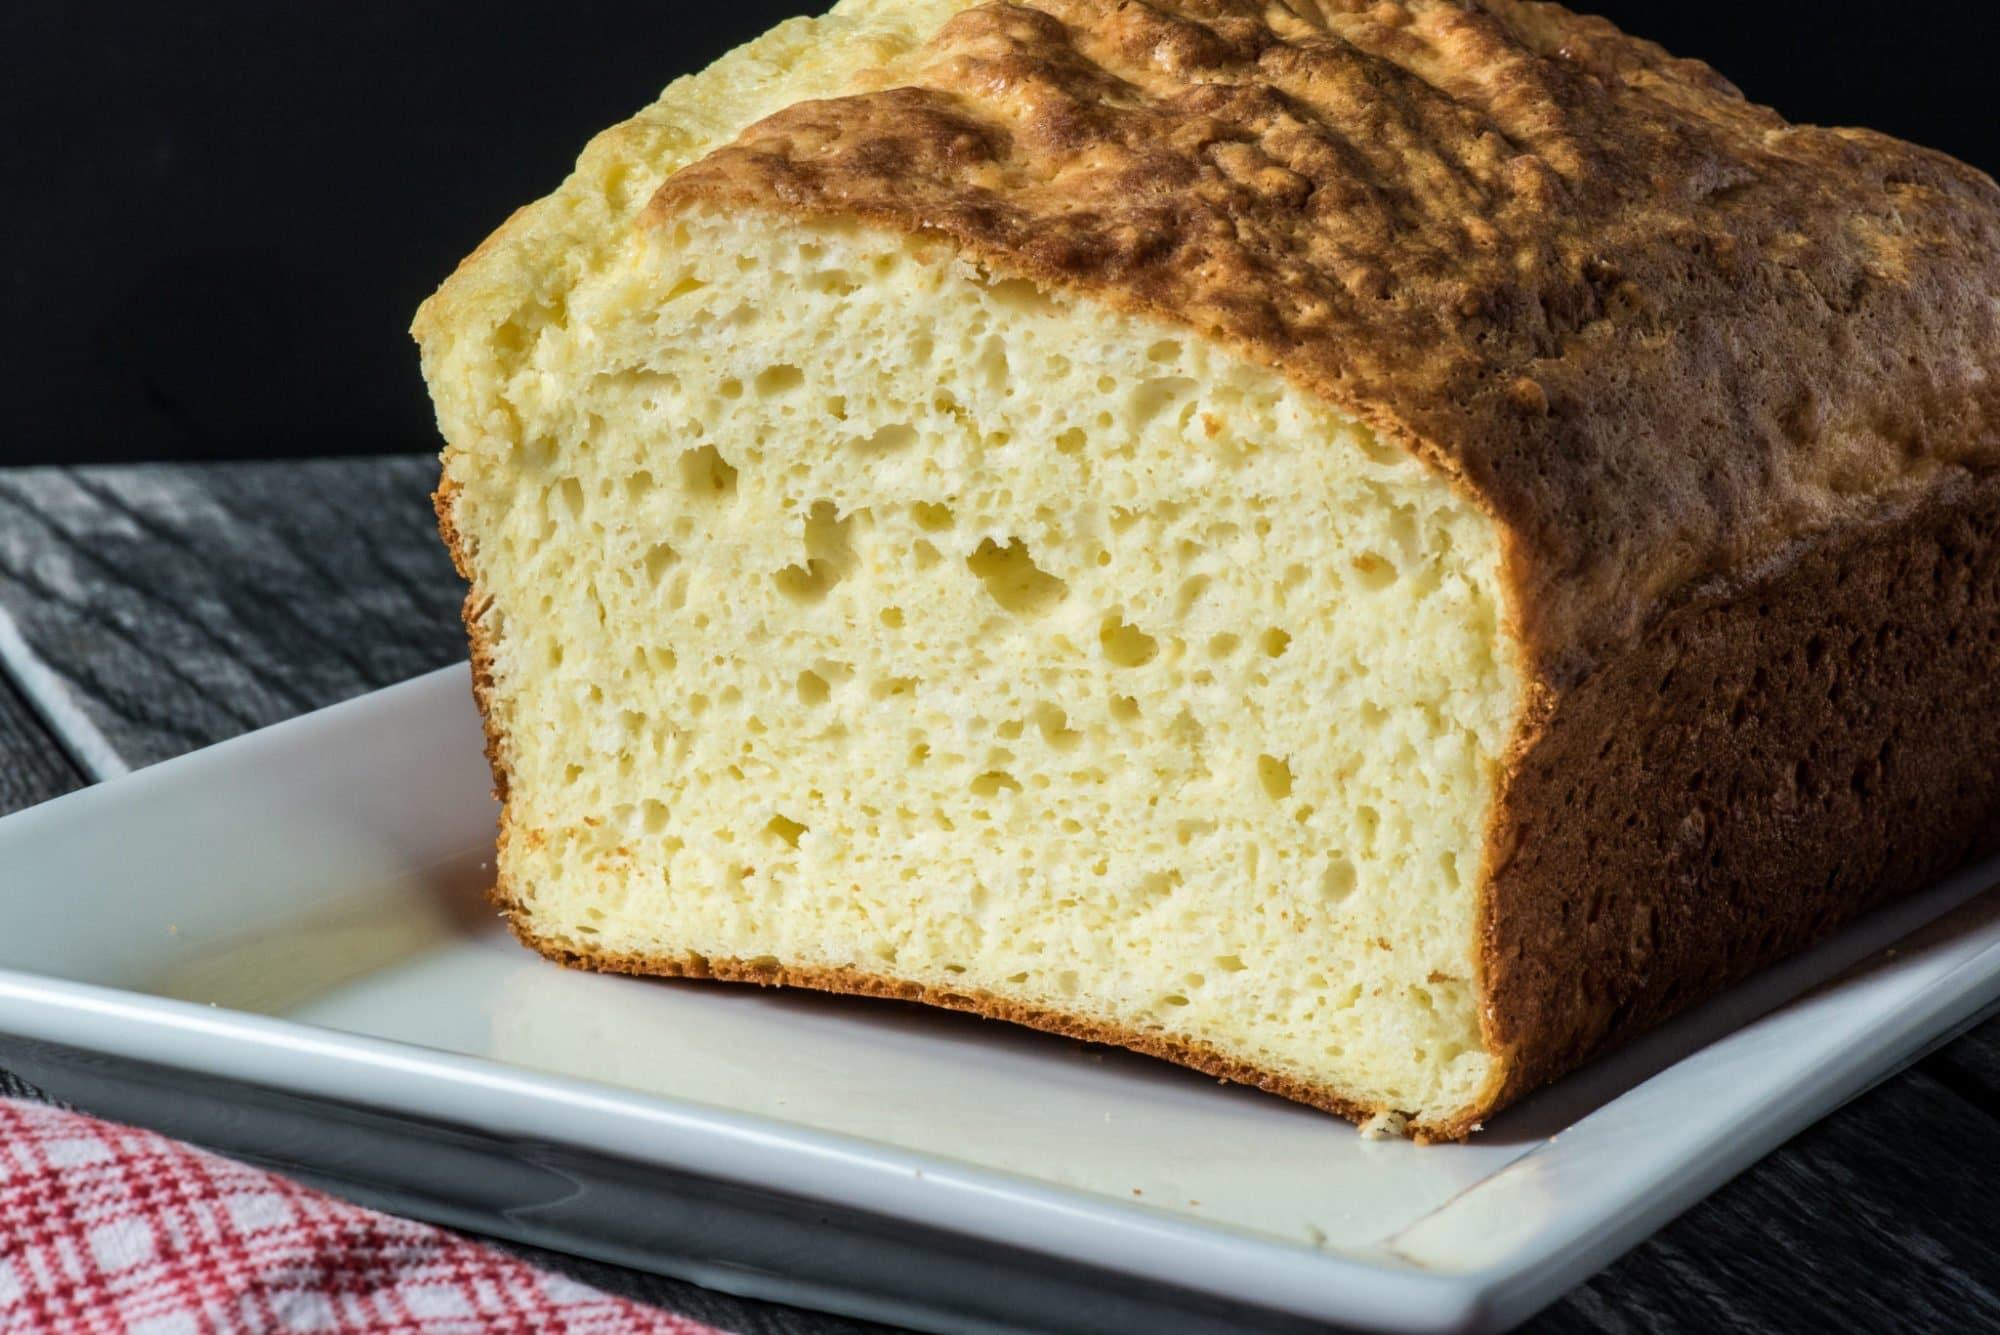 Low Carb Soul Bread - Original Recipe - Tasty Low Carb